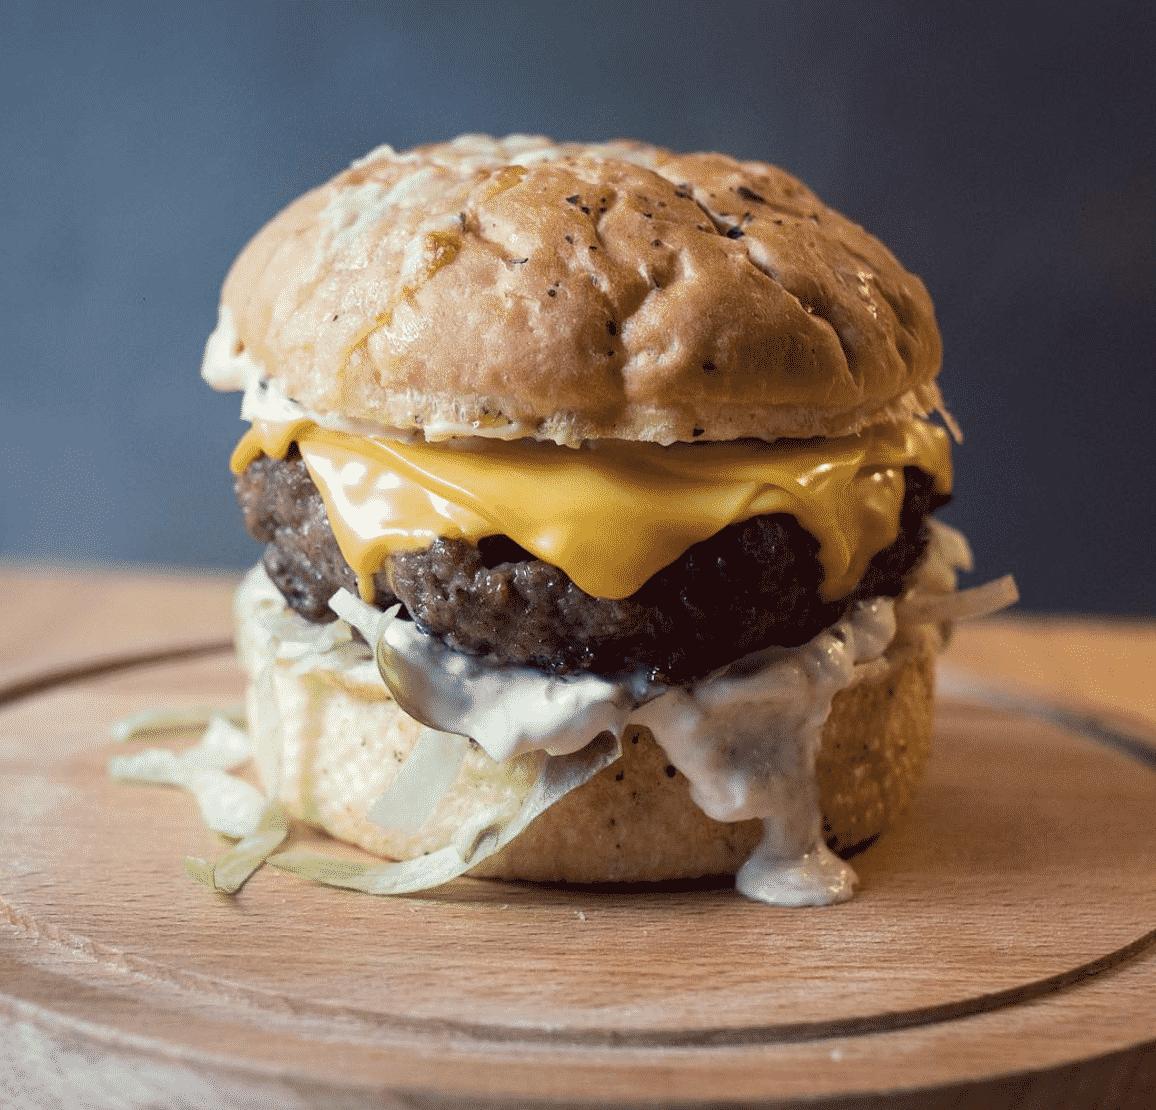 Burger House Kitchen and Bar